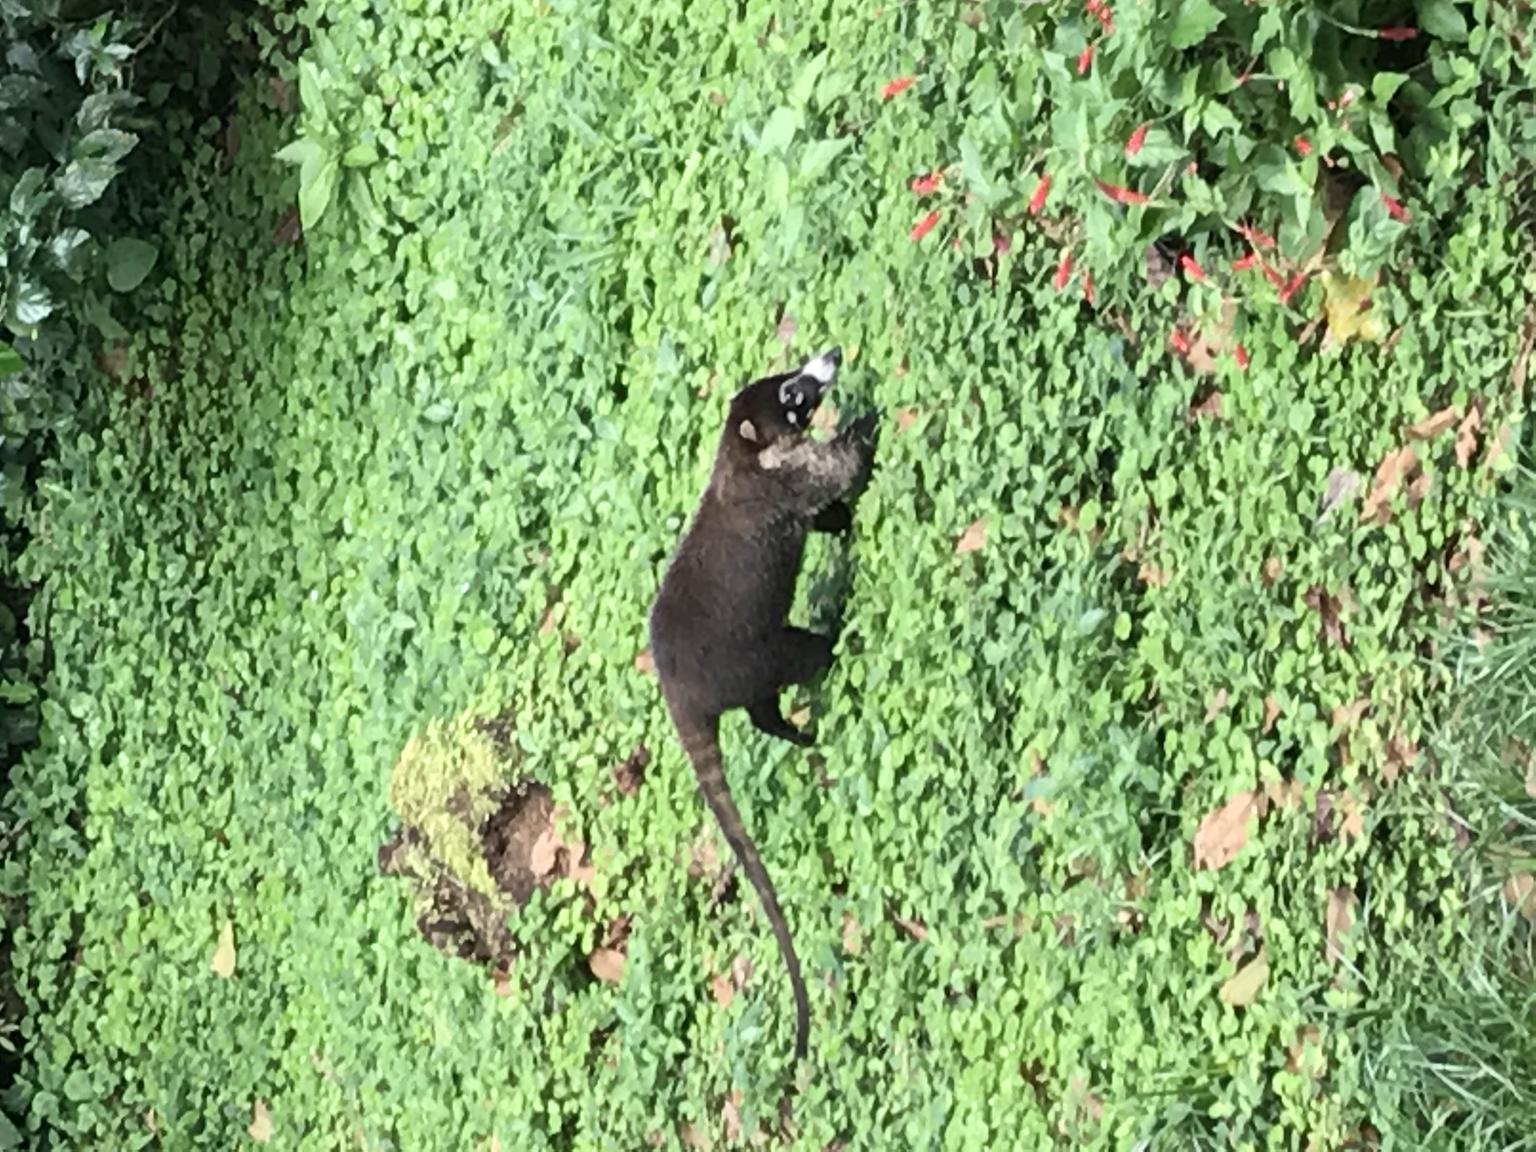 MÁS FOTOS, Rio Celeste Hiking, Sloth Sanctuary & Llanos de Cortes Waterfall Tour